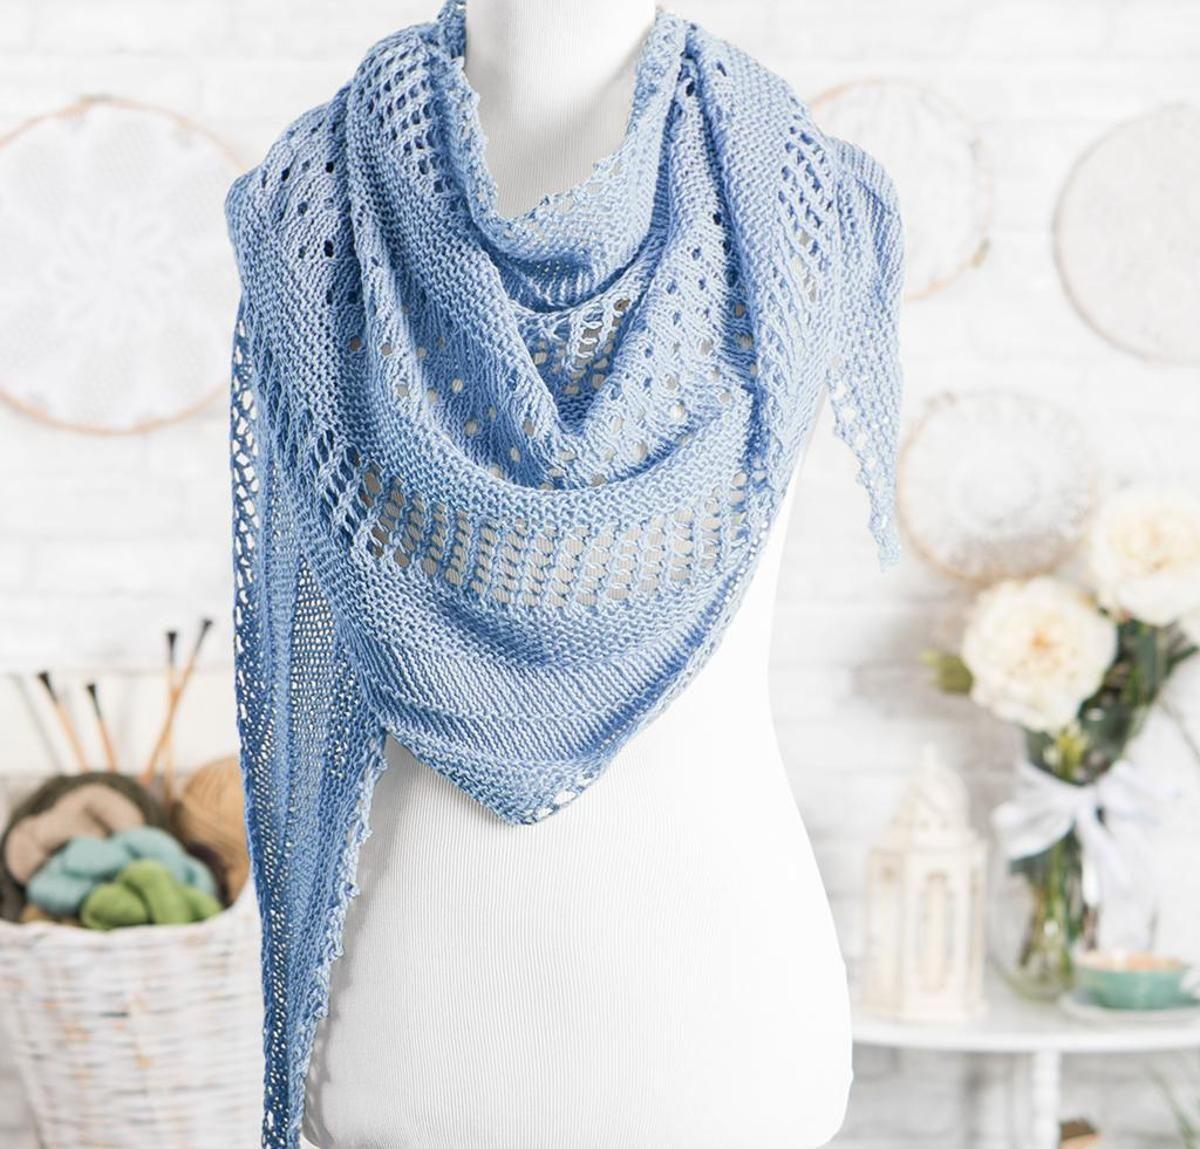 Over the Sea to Skye Lace Shawl Knitting Kit | Shawl, Yarns and Patterns